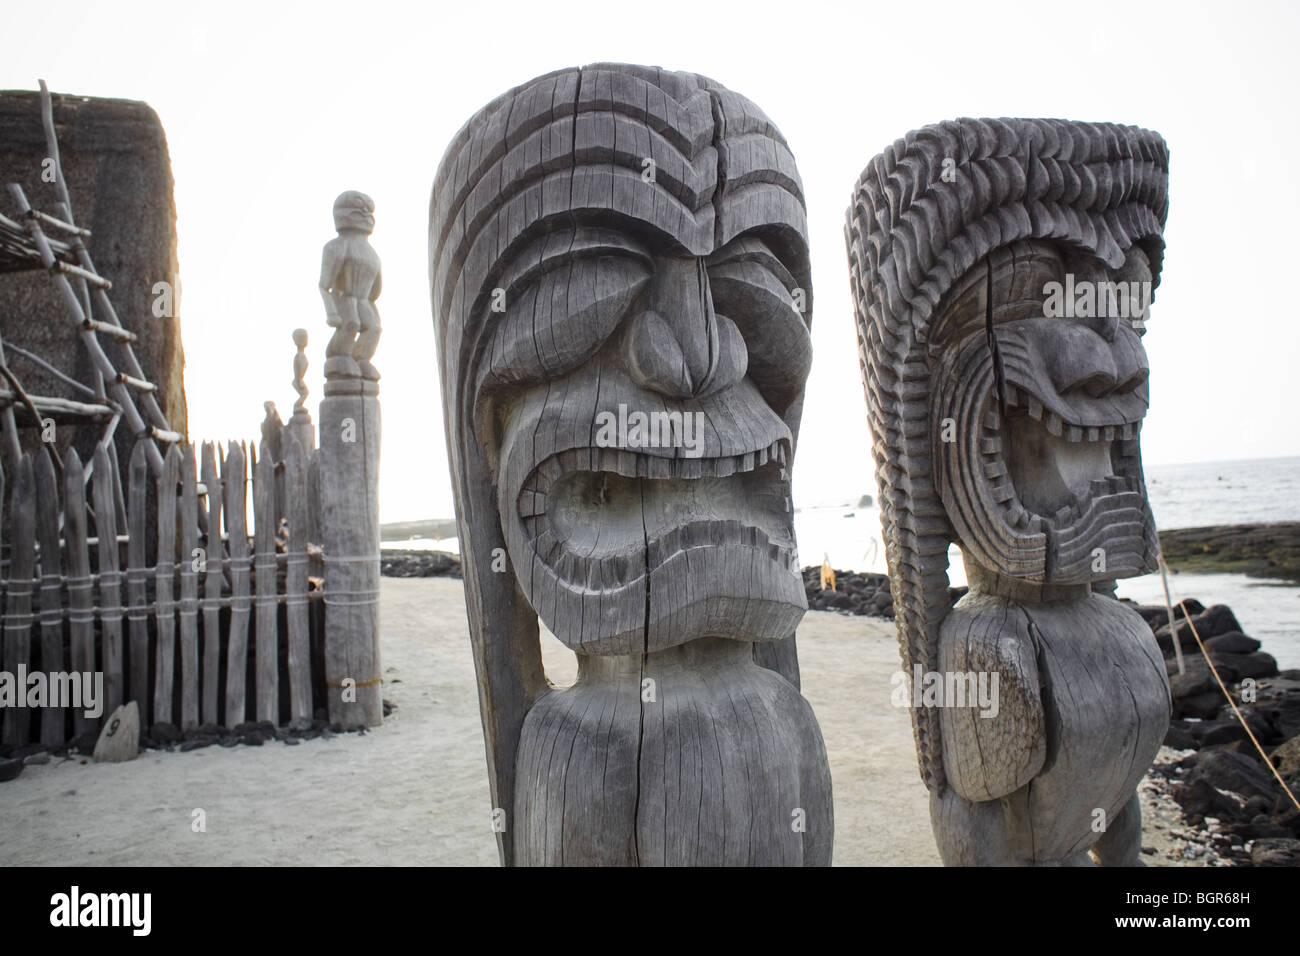 Tiki statues with big expressions at the Pu`uhonua o Honaunau (place of refuge) on the Big Island in Hawaii - Stock Image